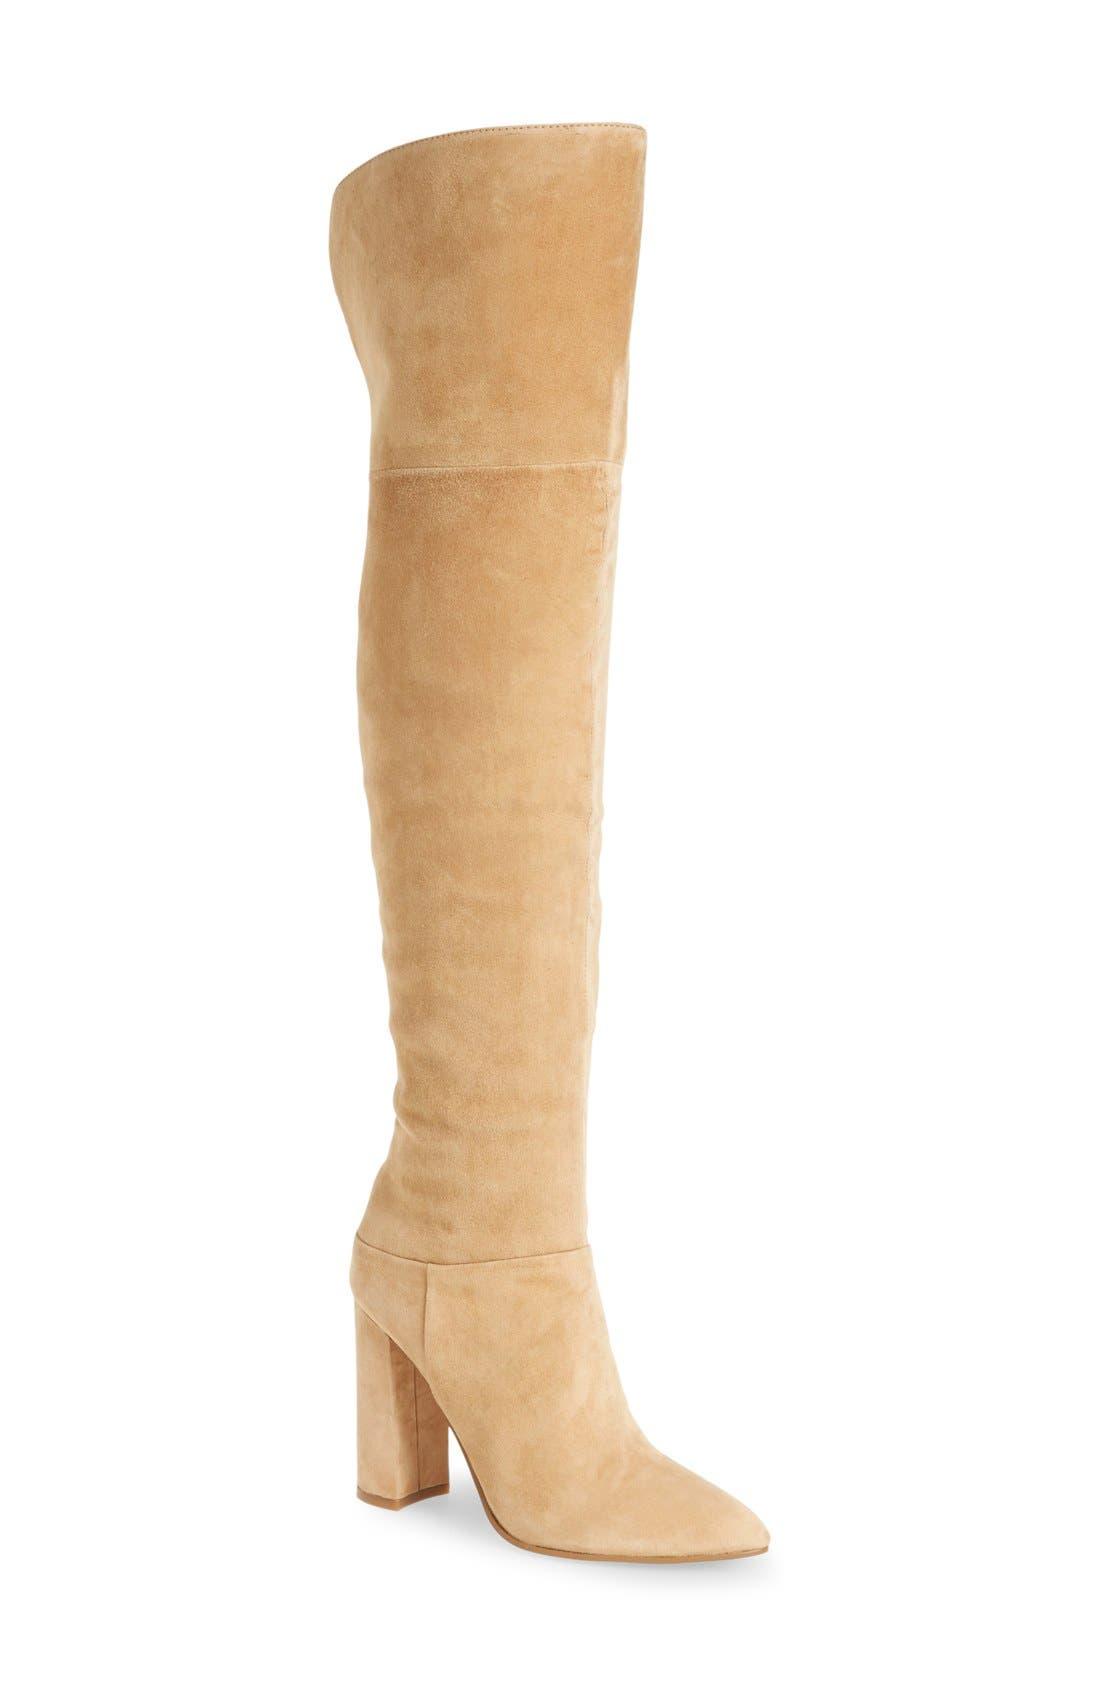 Main Image - Marc Fisher LTD 'Breley' Over the Knee Boot (Women)